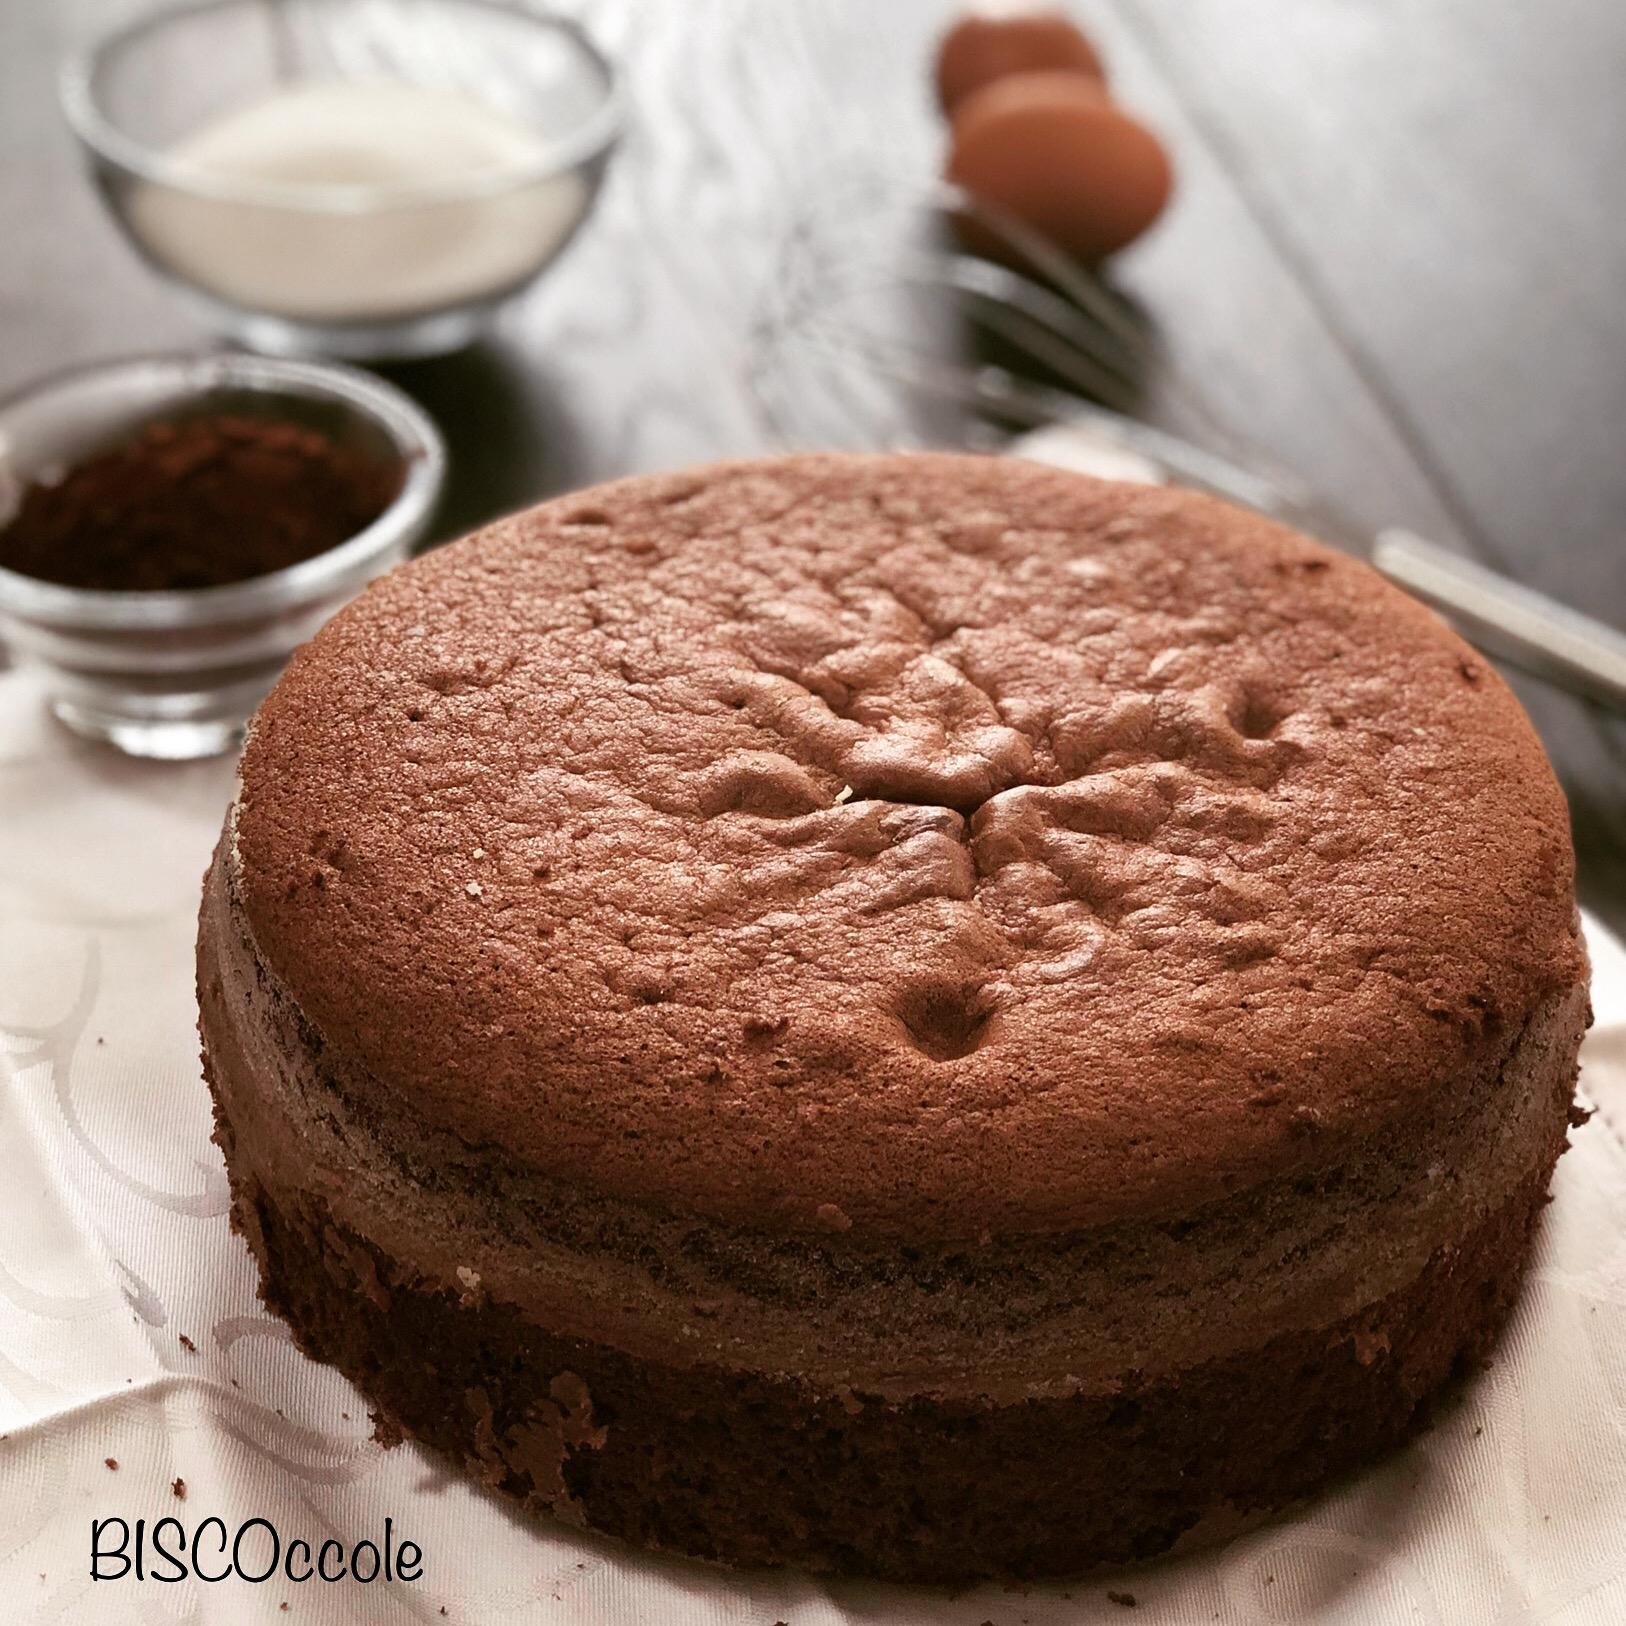 Ricetta Pan Di Spagna Al Cioccolato Bimby.Pan Di Spagna Al Cacao Ricetta Con E Senza Bimby Biscoccole Dintorni